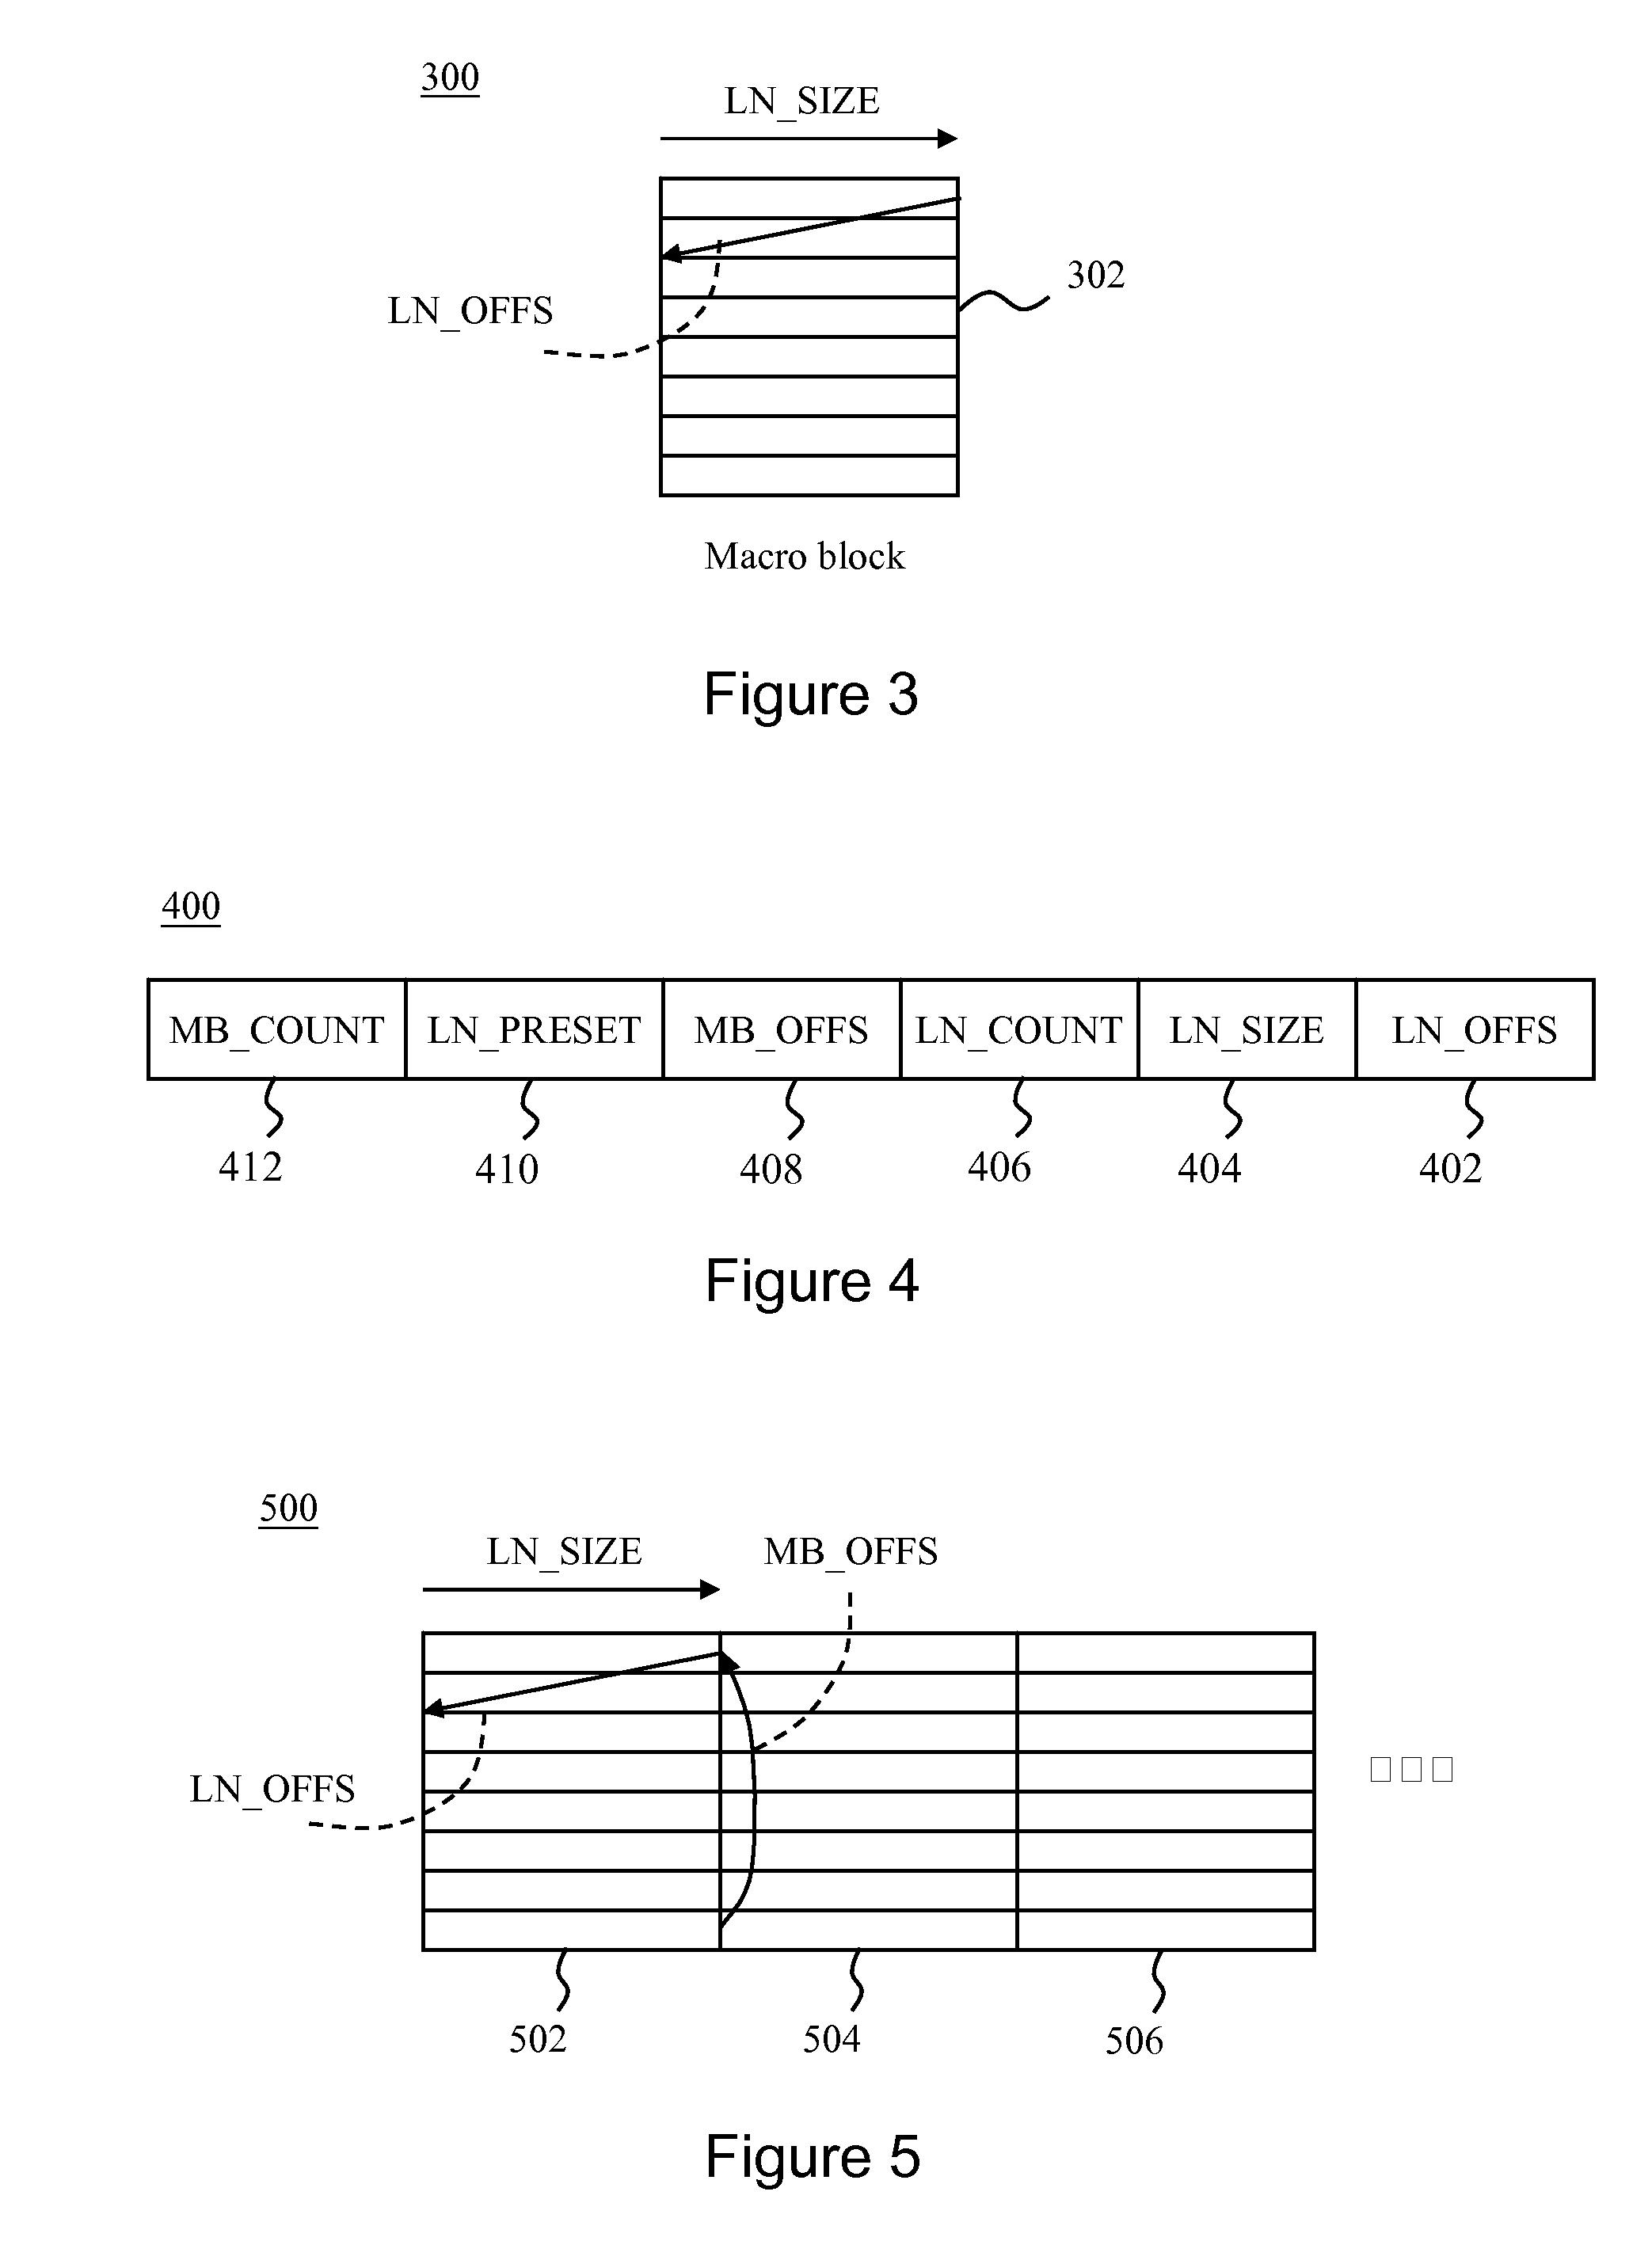 براءة الاختراع US20070162643 - Fixed offset scatter/gather dma